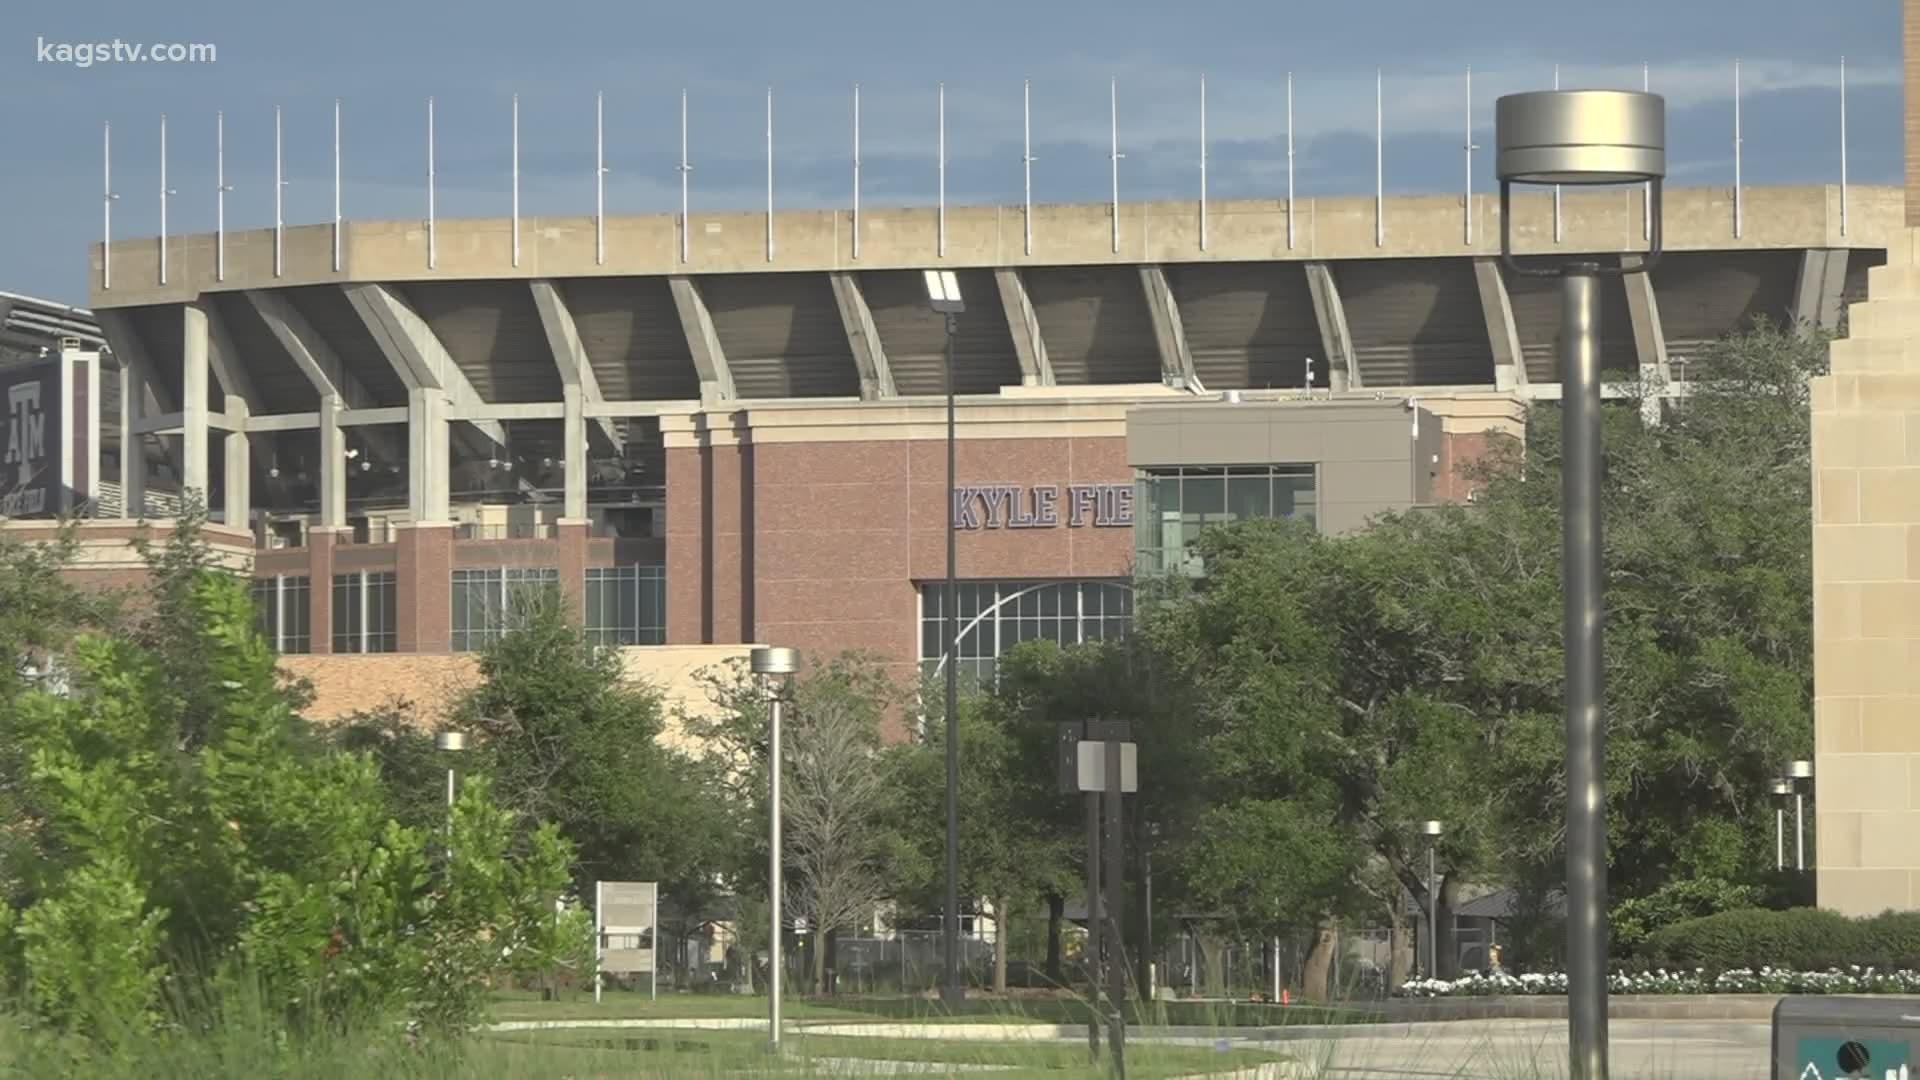 Texas A M Updates Fall 2020 Semester Plans Kagstv Com